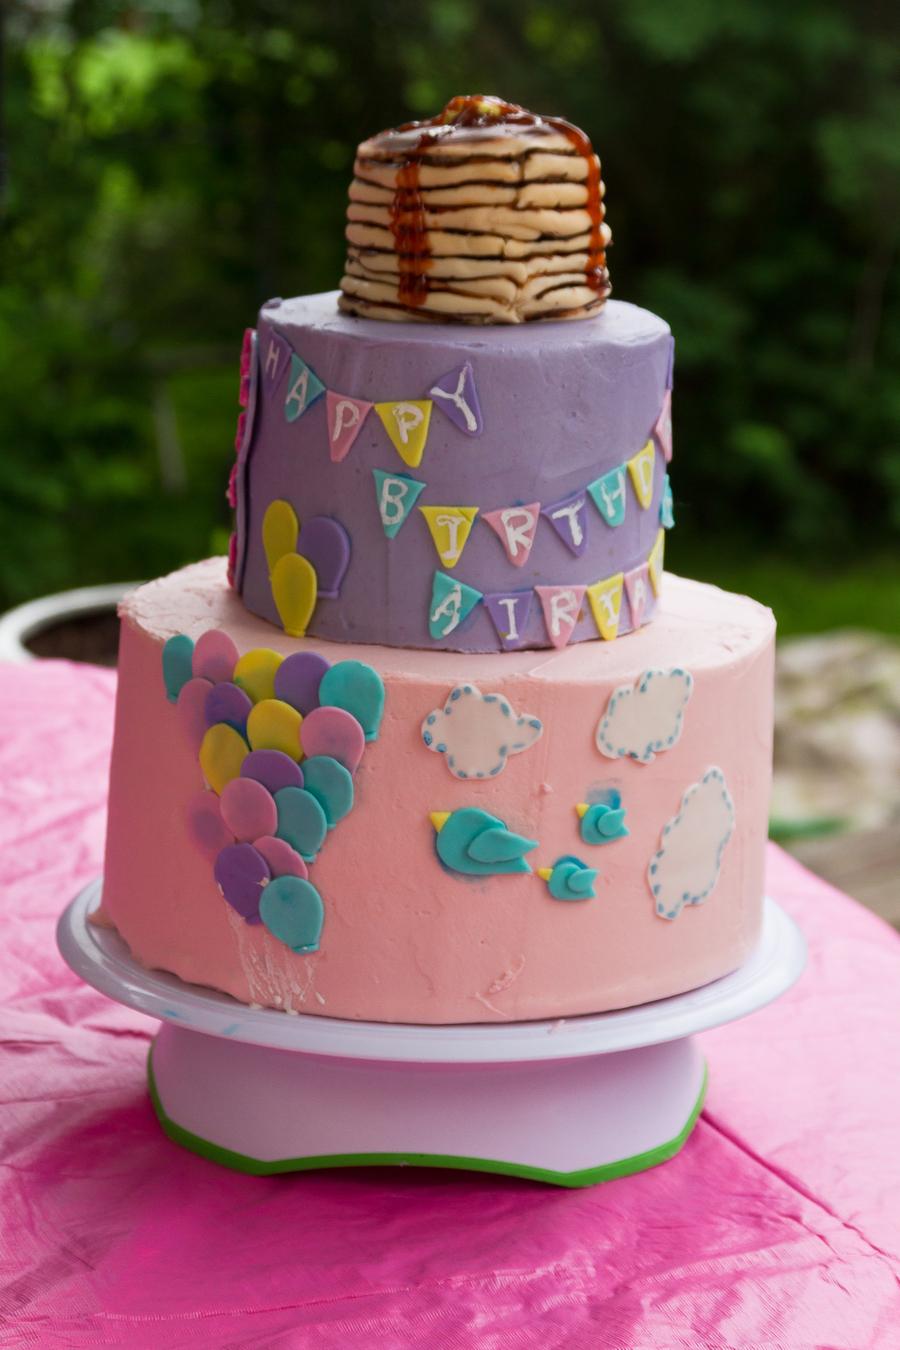 Outdoor Pajama And Pancakebreakfast Birthday Party Themeso I Created